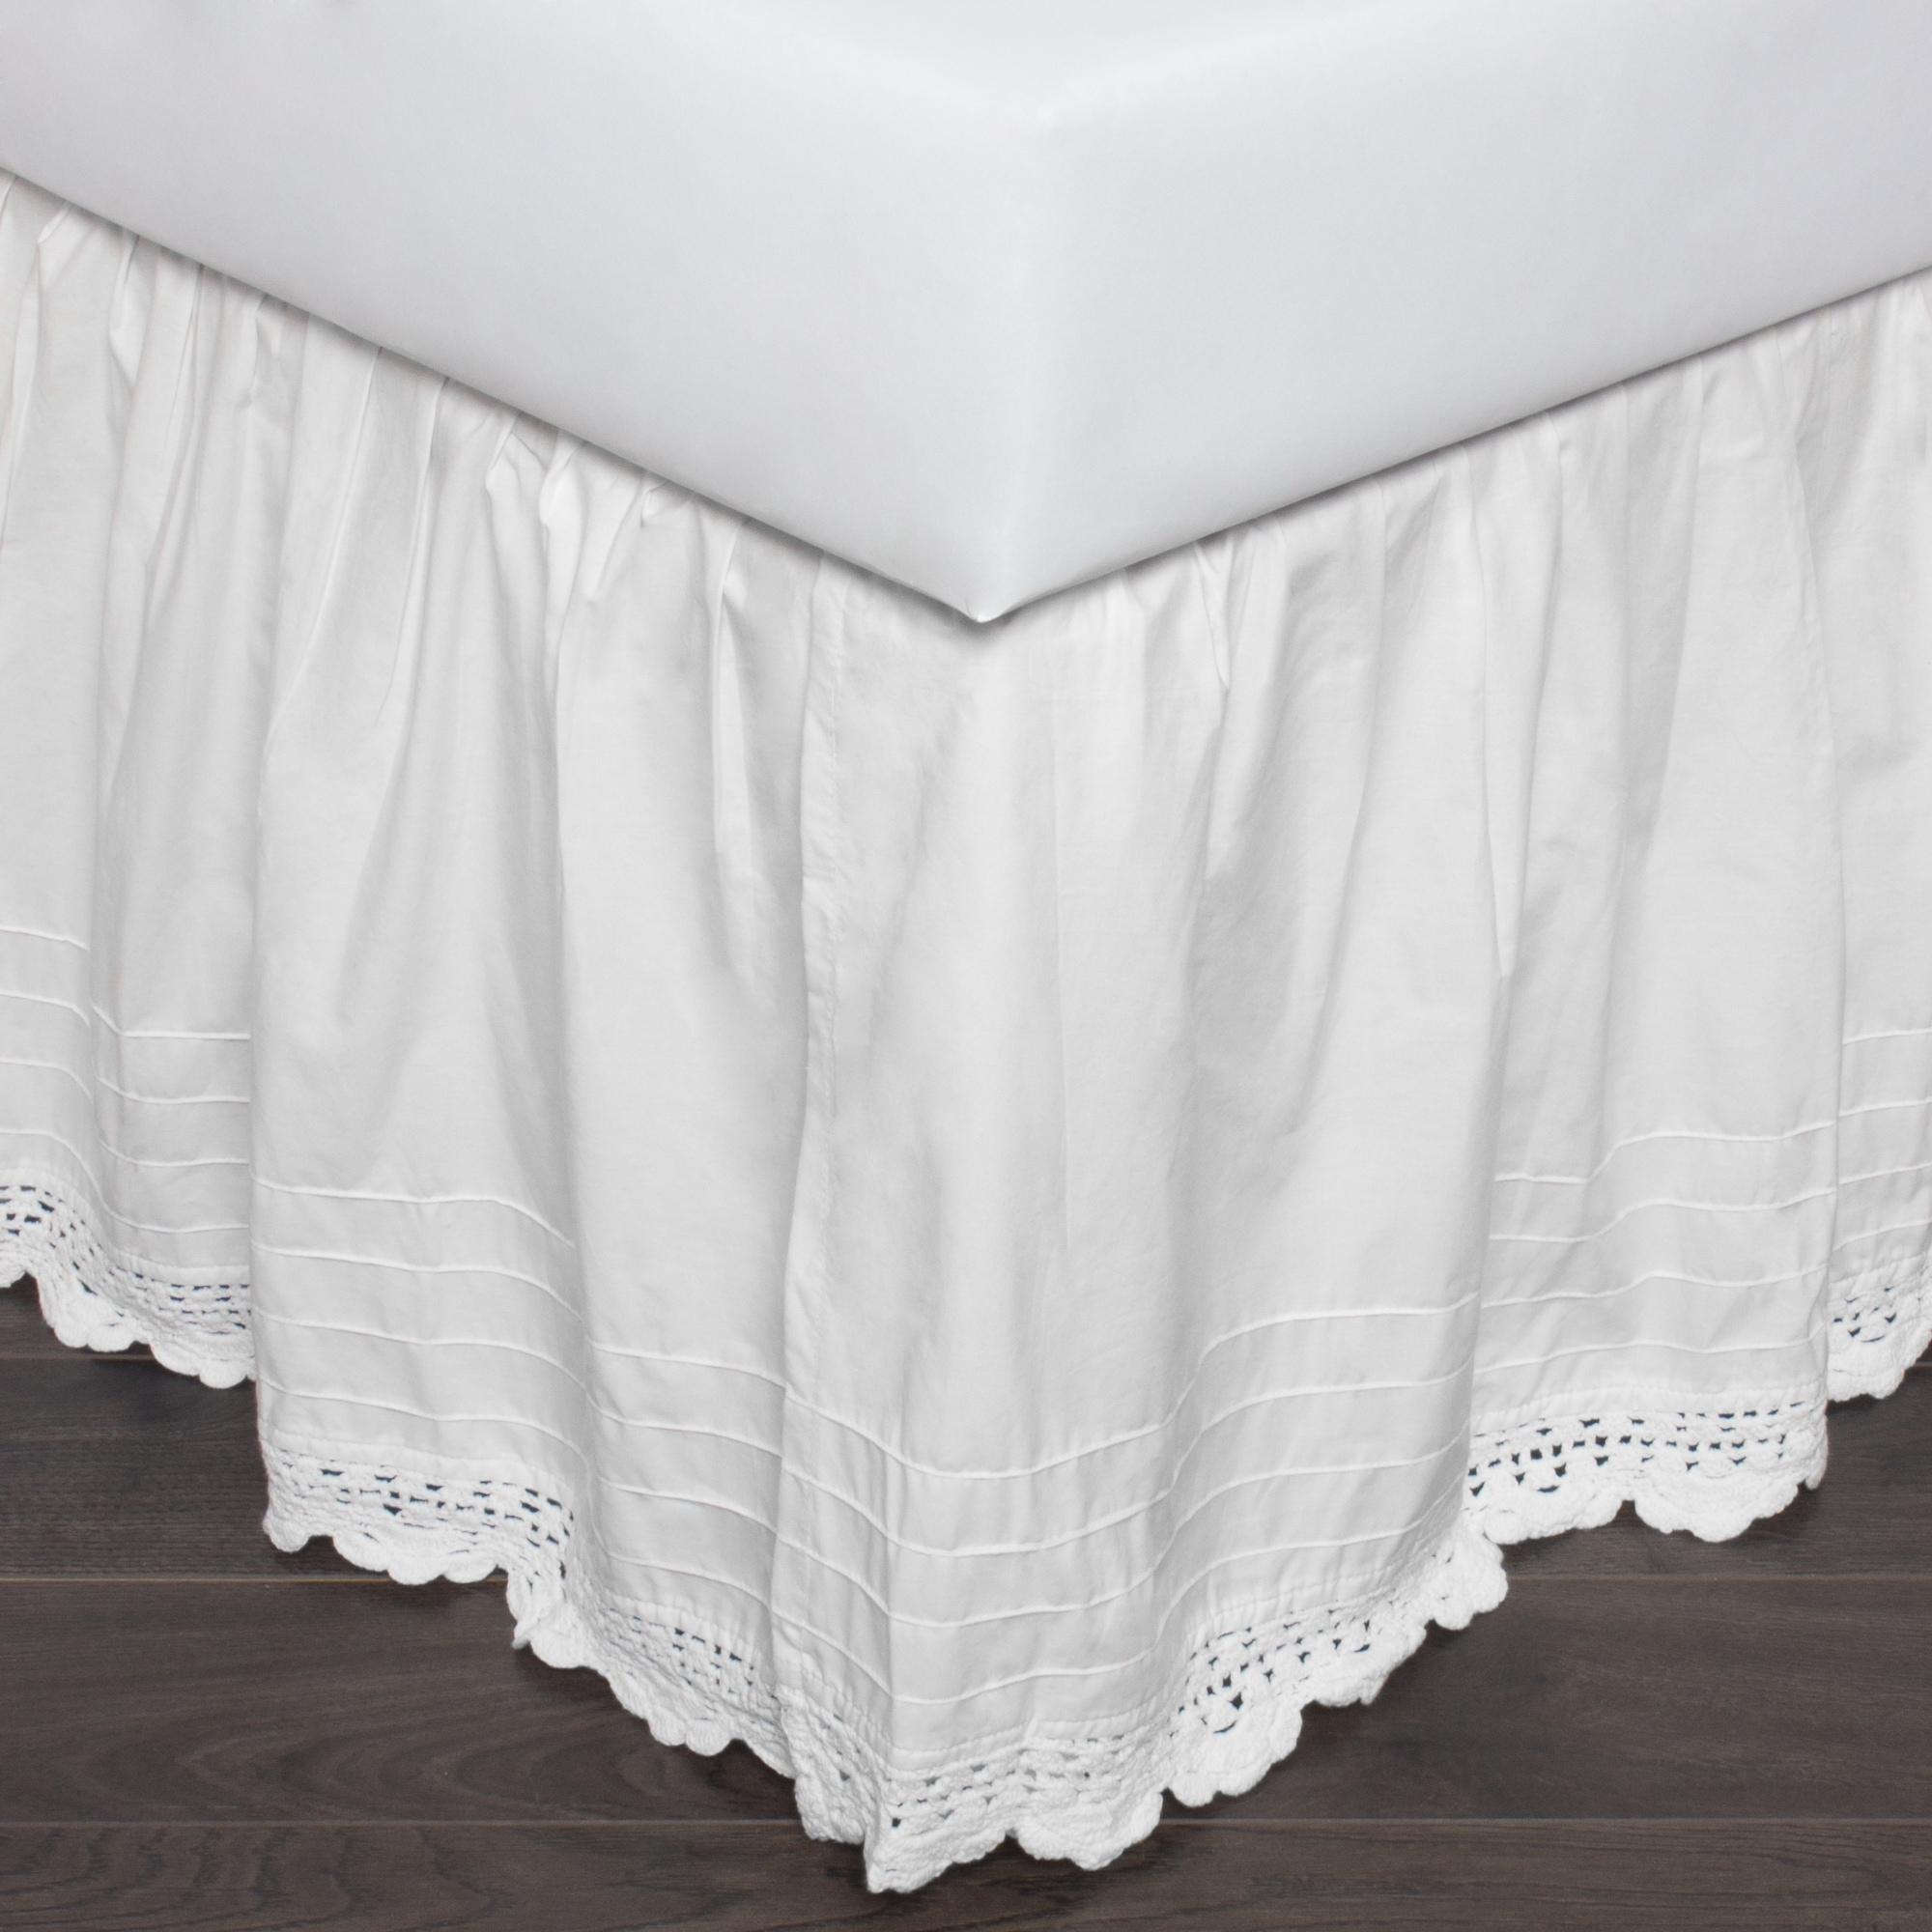 Bedding 25 Full Tan Bed Skirt Or Dust Ruffle Split Corners Home Furniture Diy Pneumec In